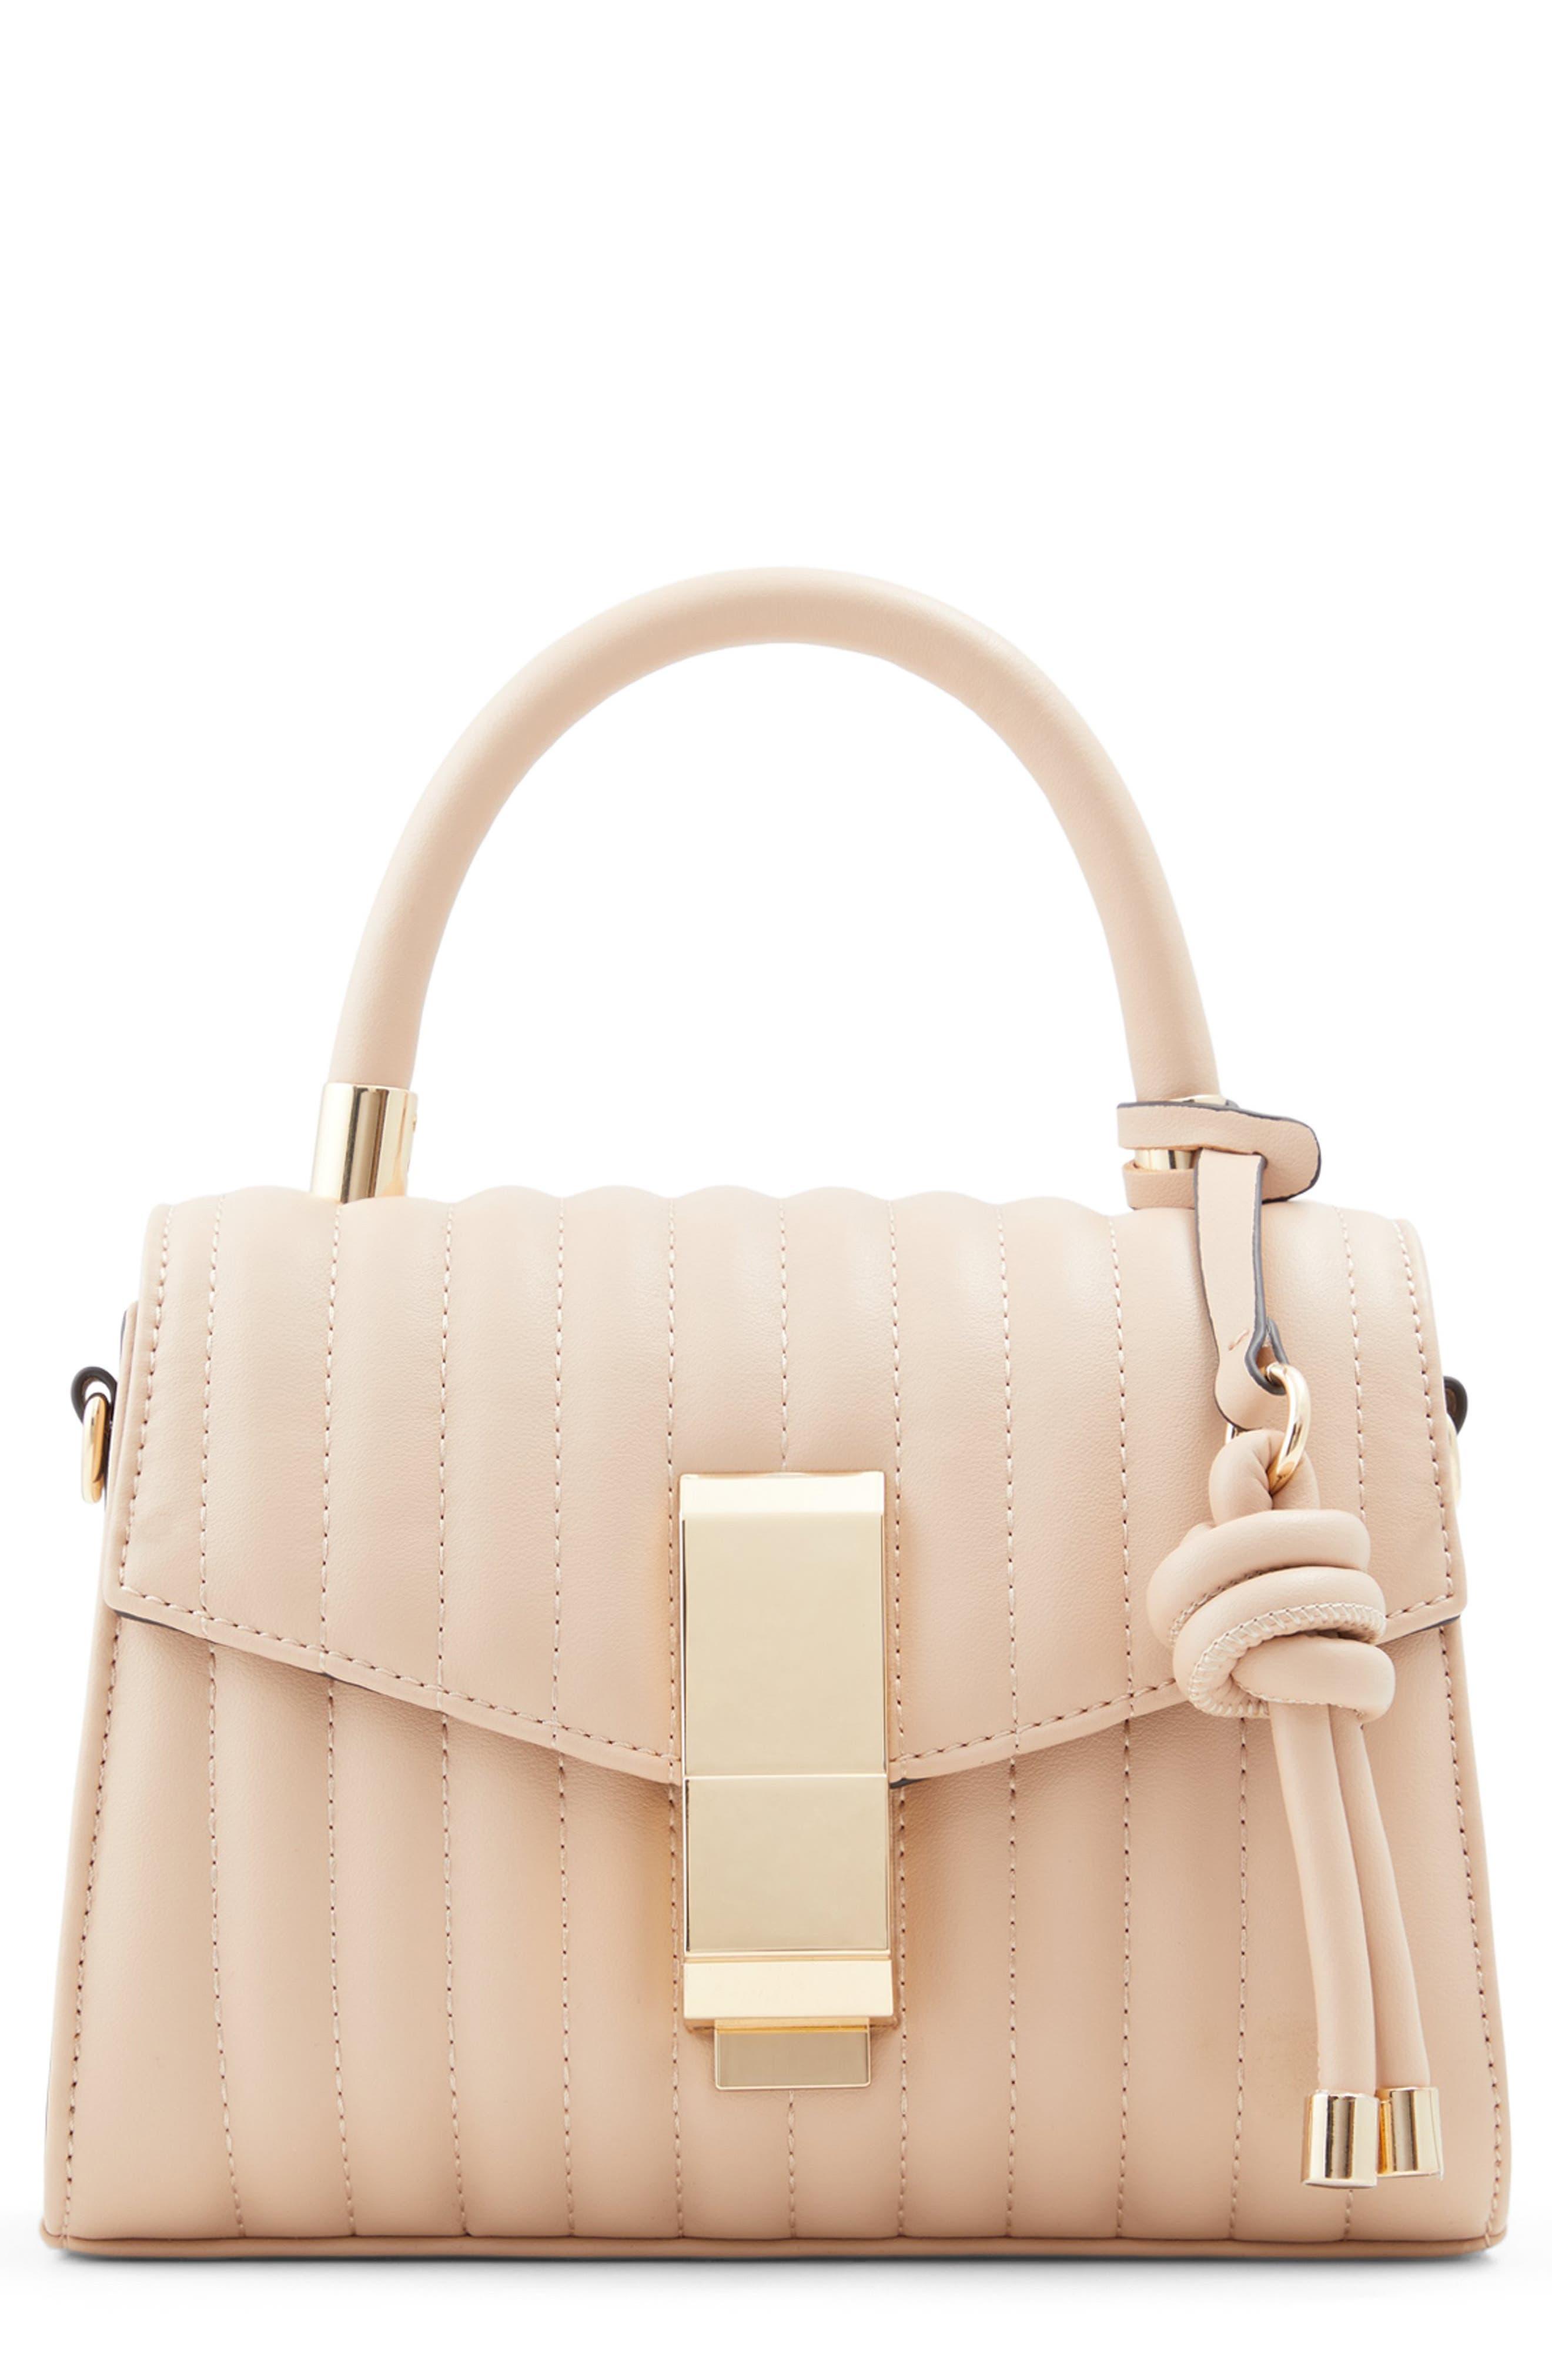 Erilissax Faux Leather Handbag